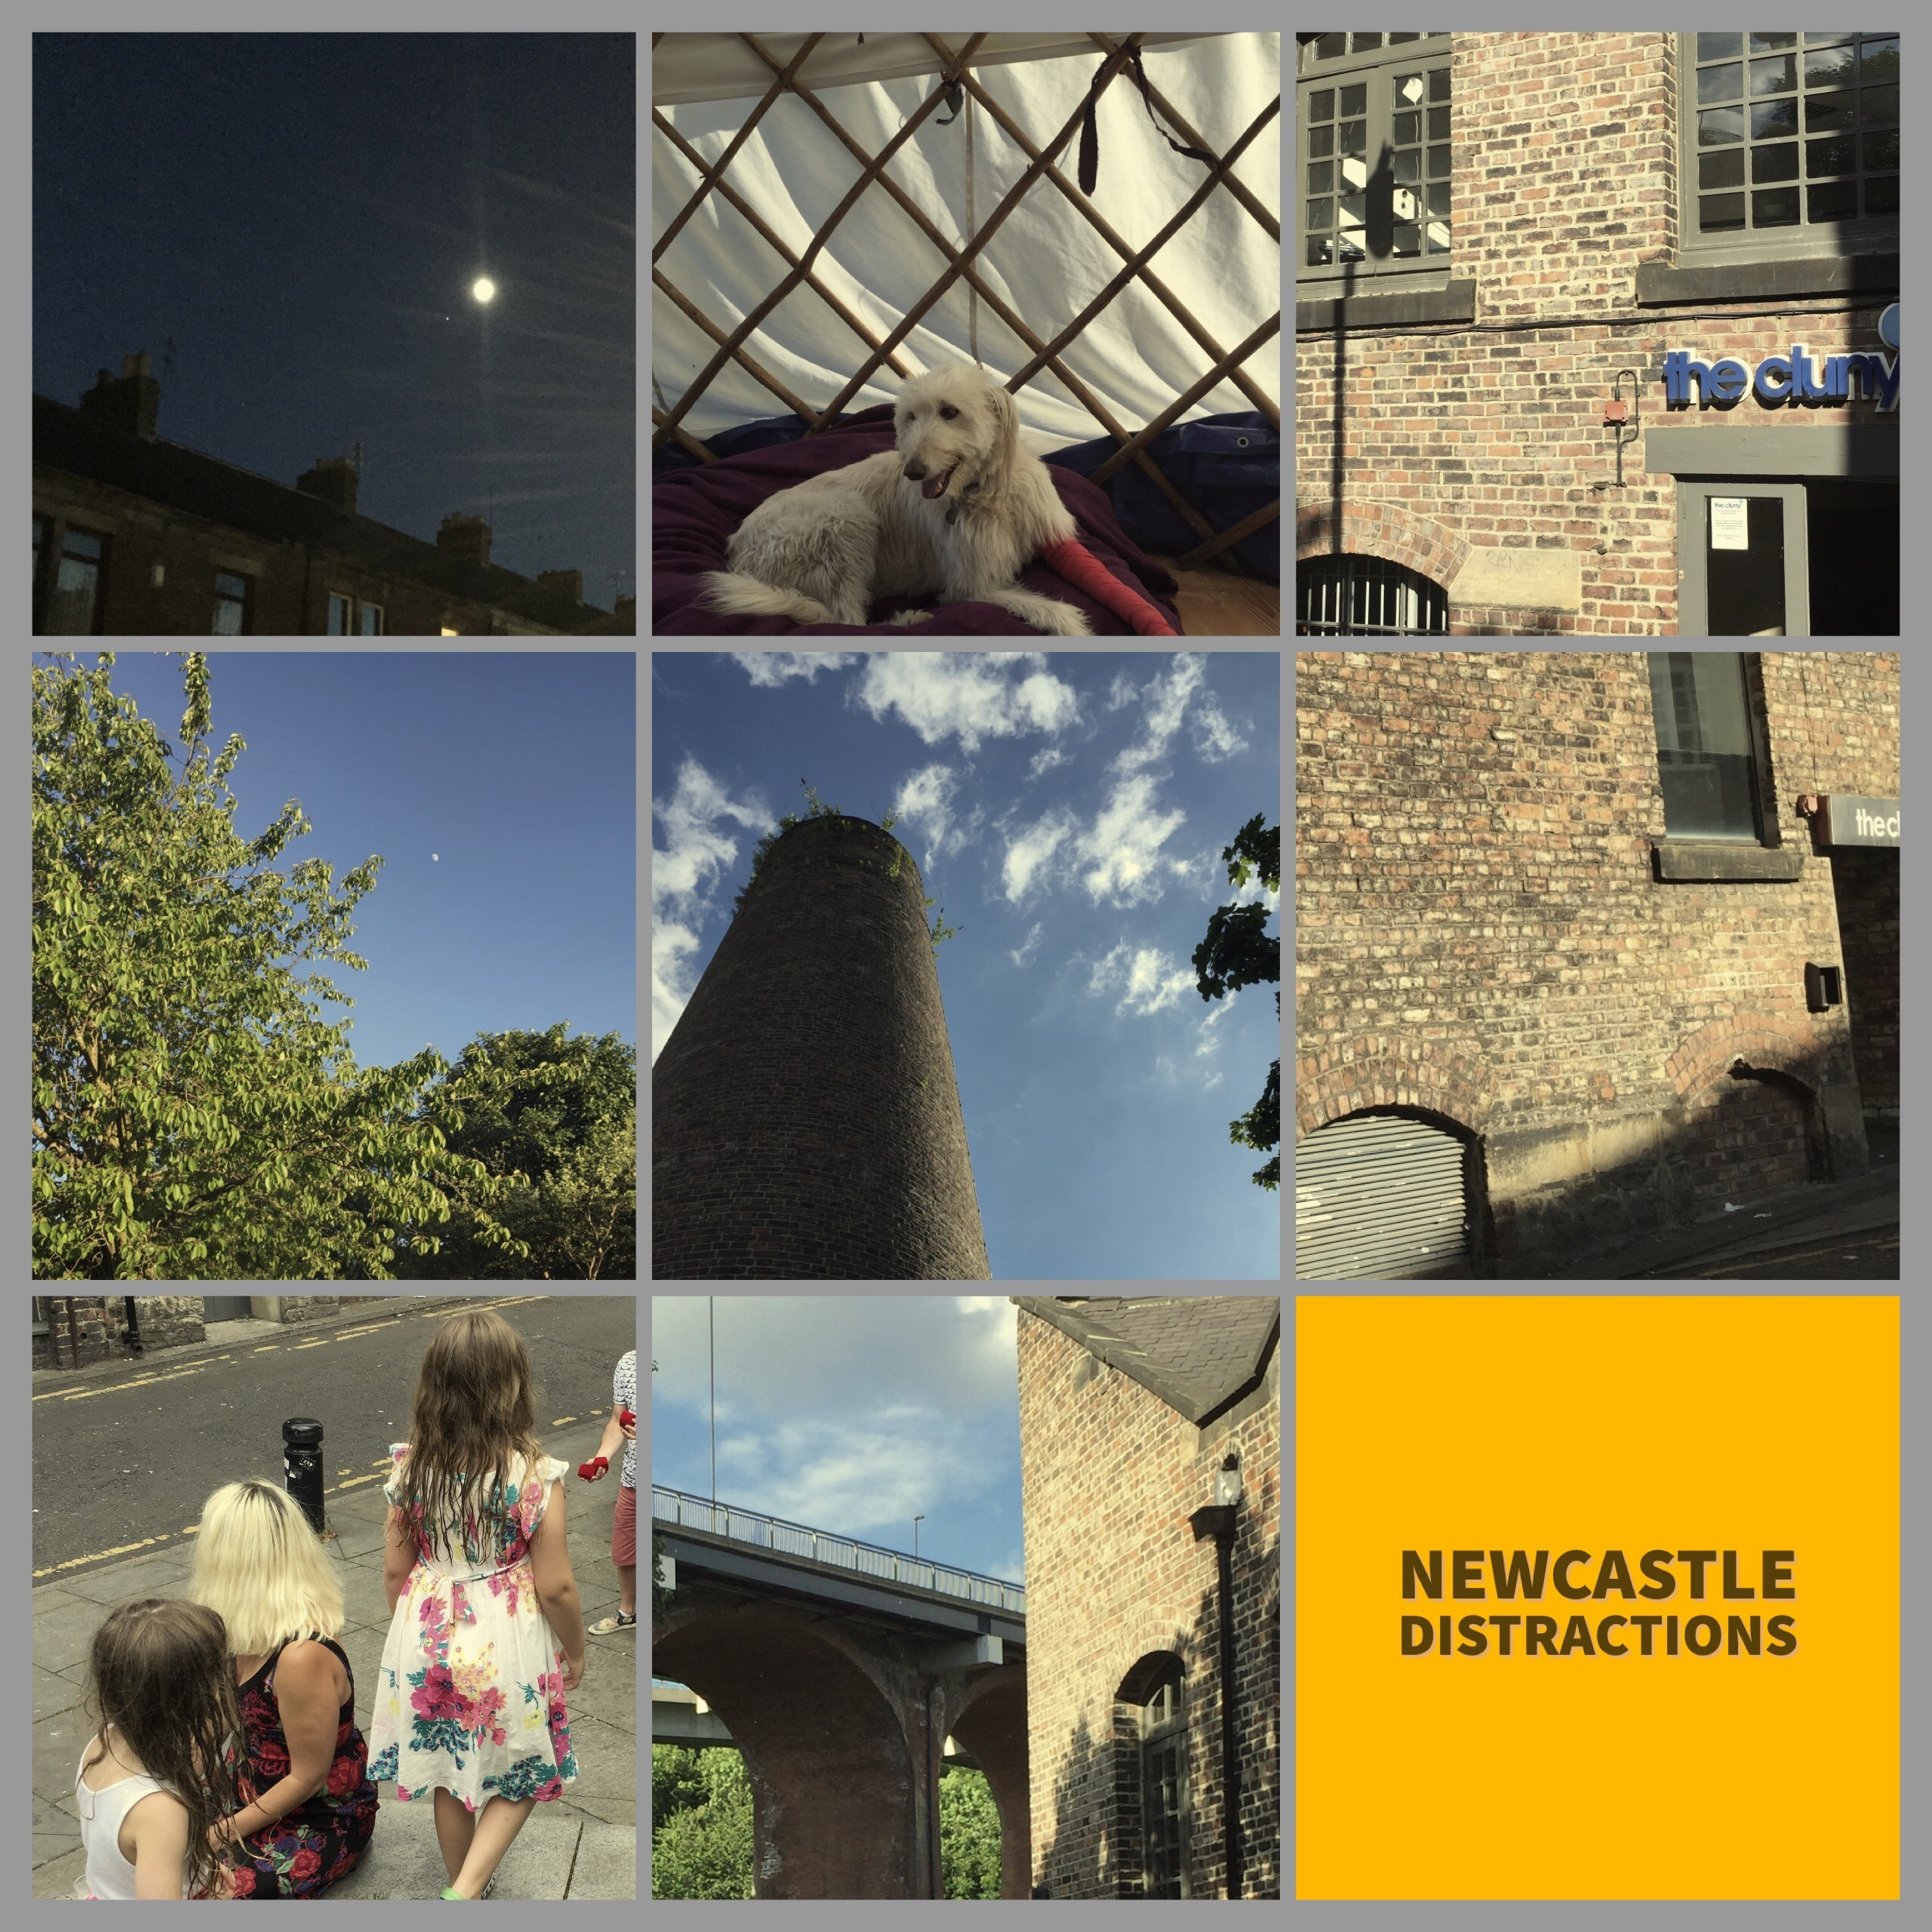 Newcastle, Ouseburn, Gosforth, Walk, shadows, juggling